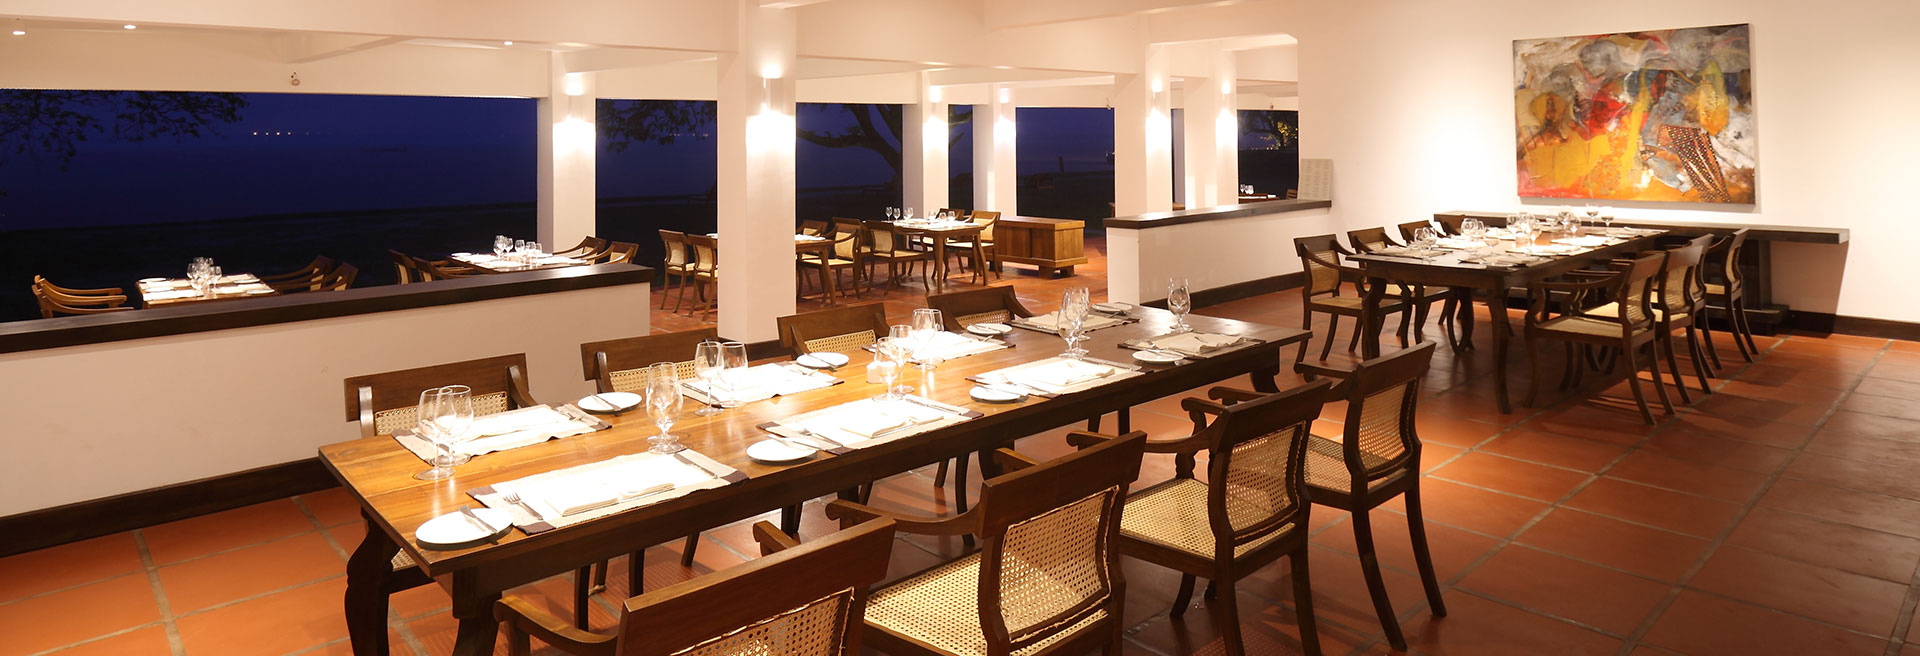 Dining At Blue Lagoon Restaurant